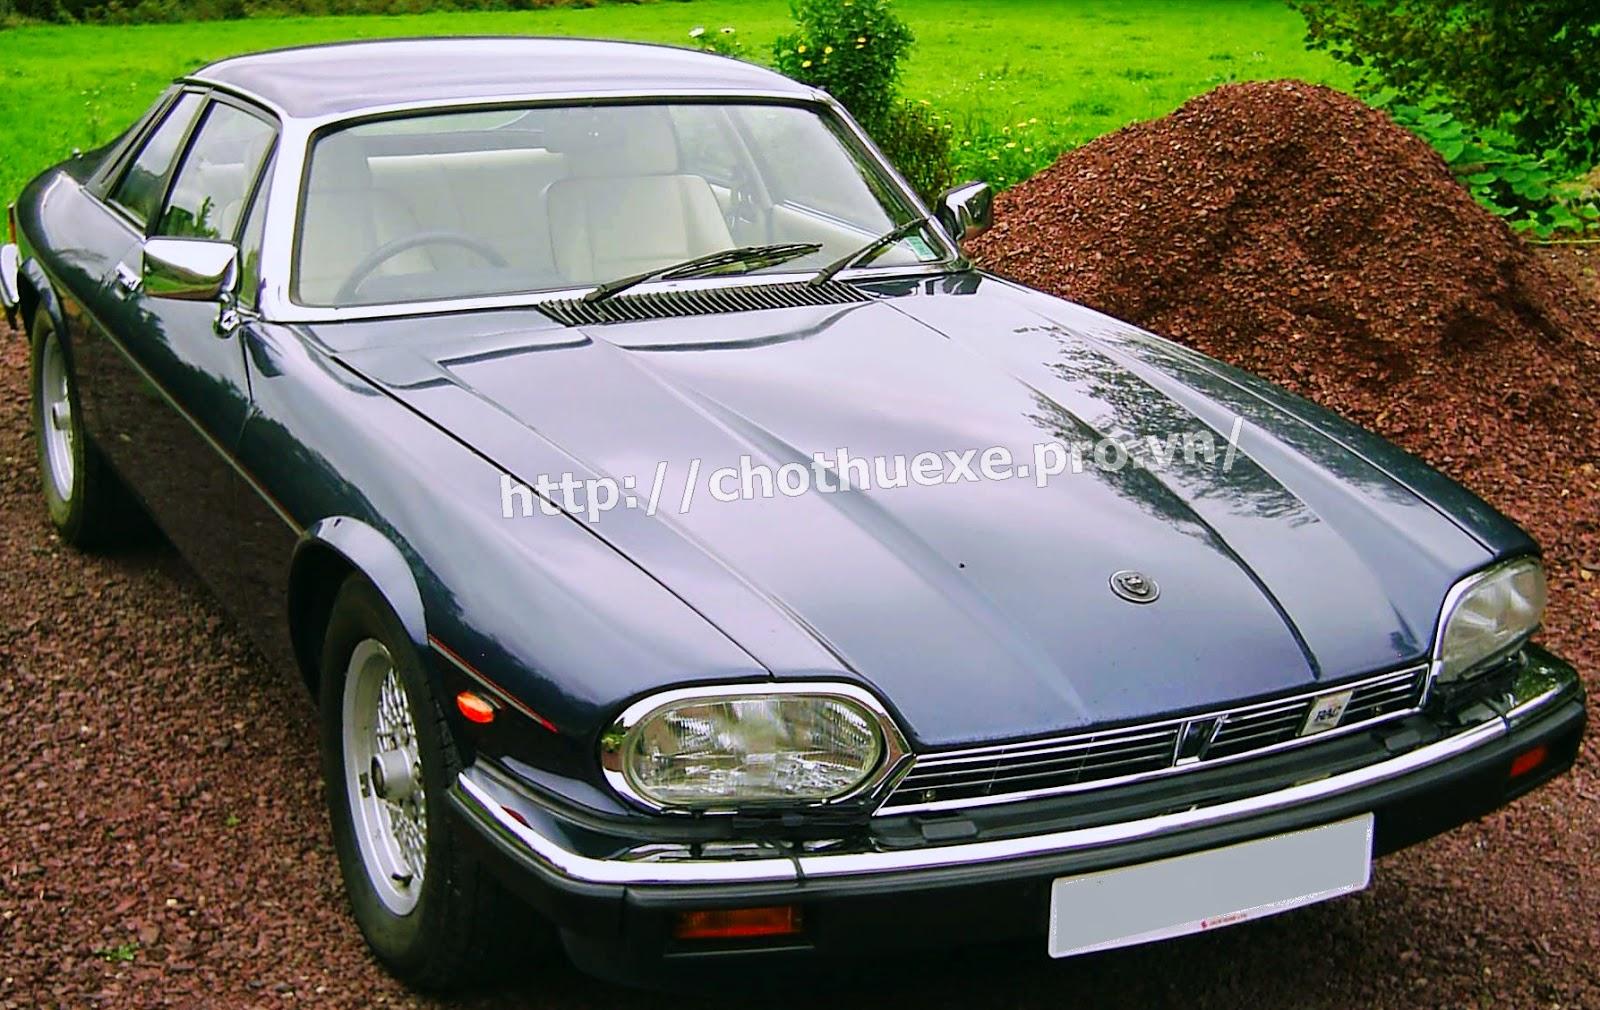 Cho thuê xe Jaguar XJ siêu sang 1